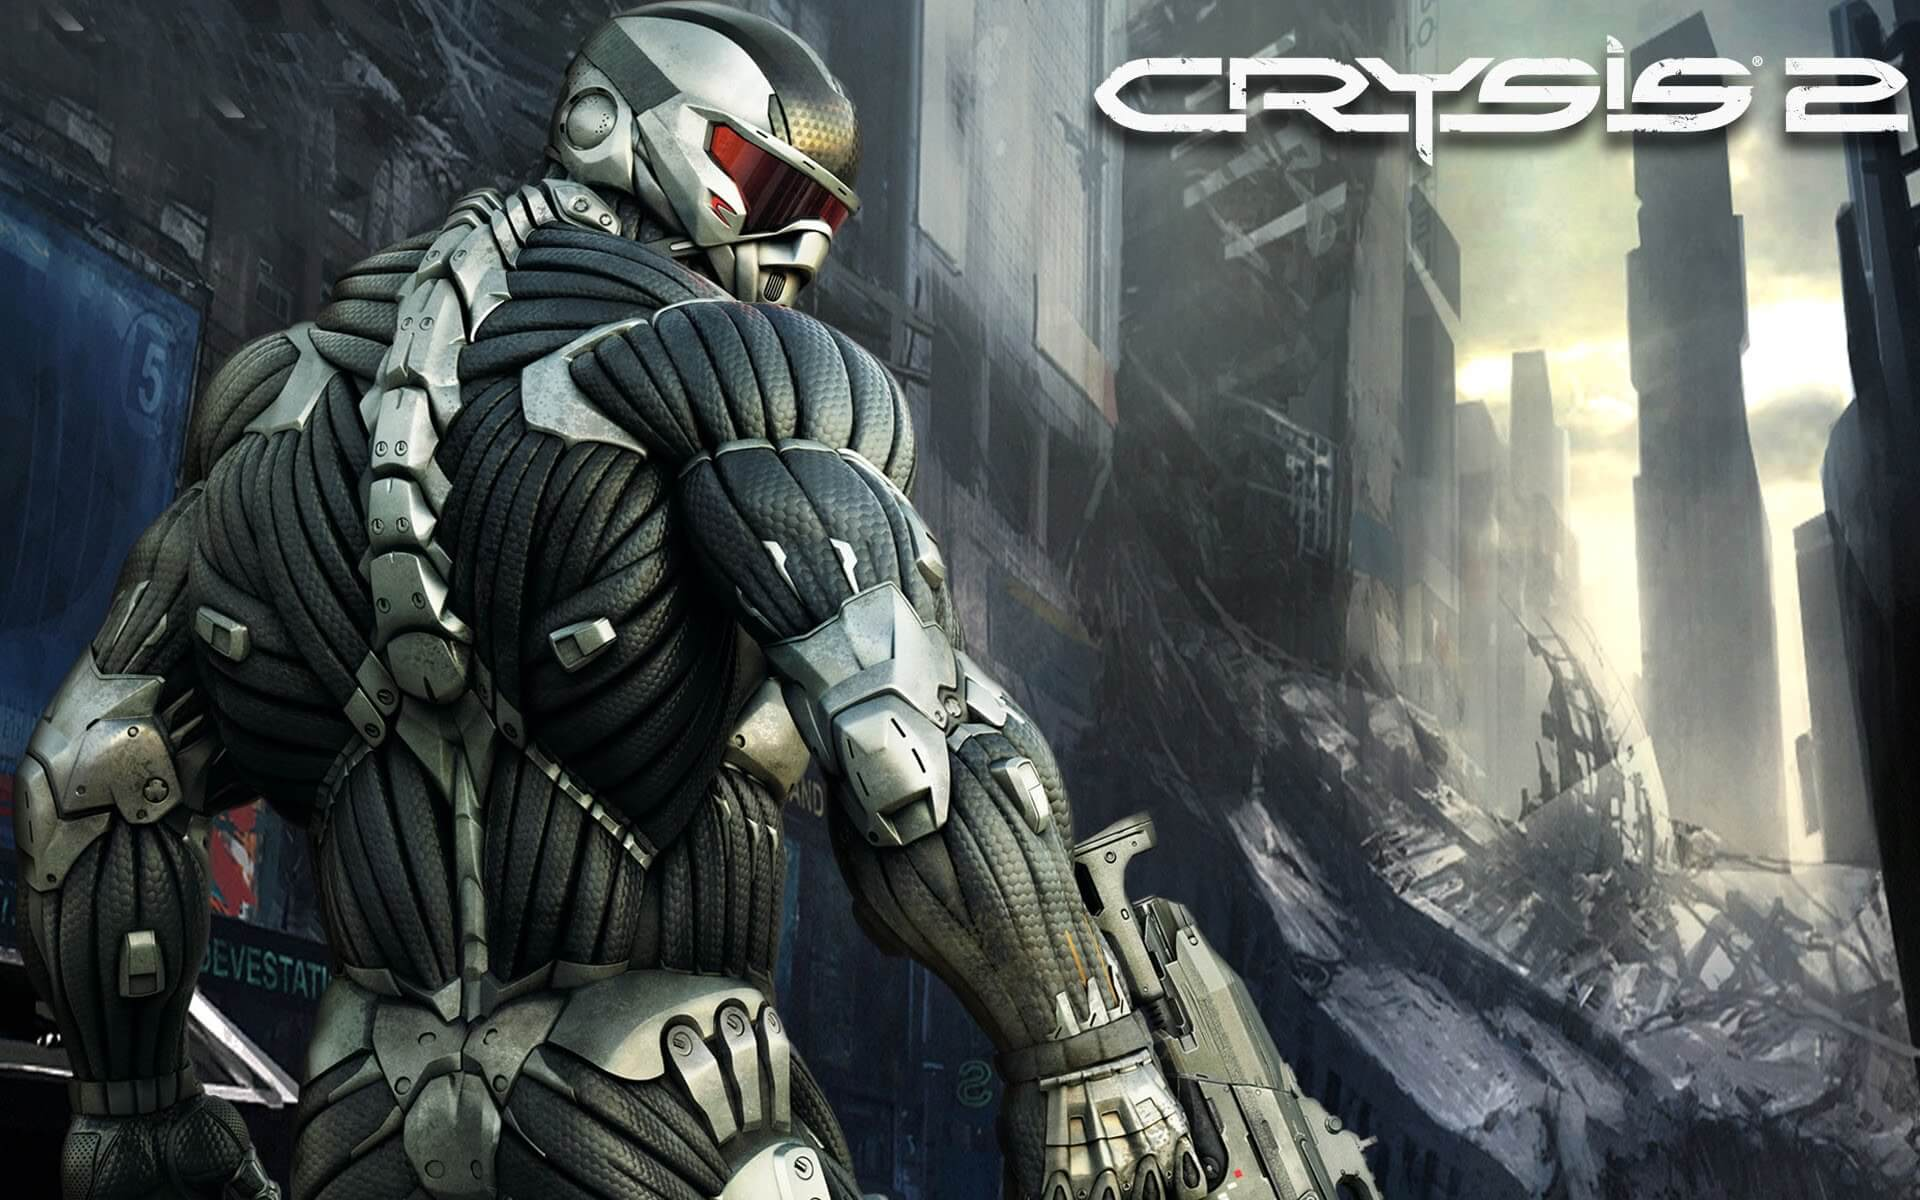 Free download games crysis 2 full version cherokee harrahs casino hotel nc